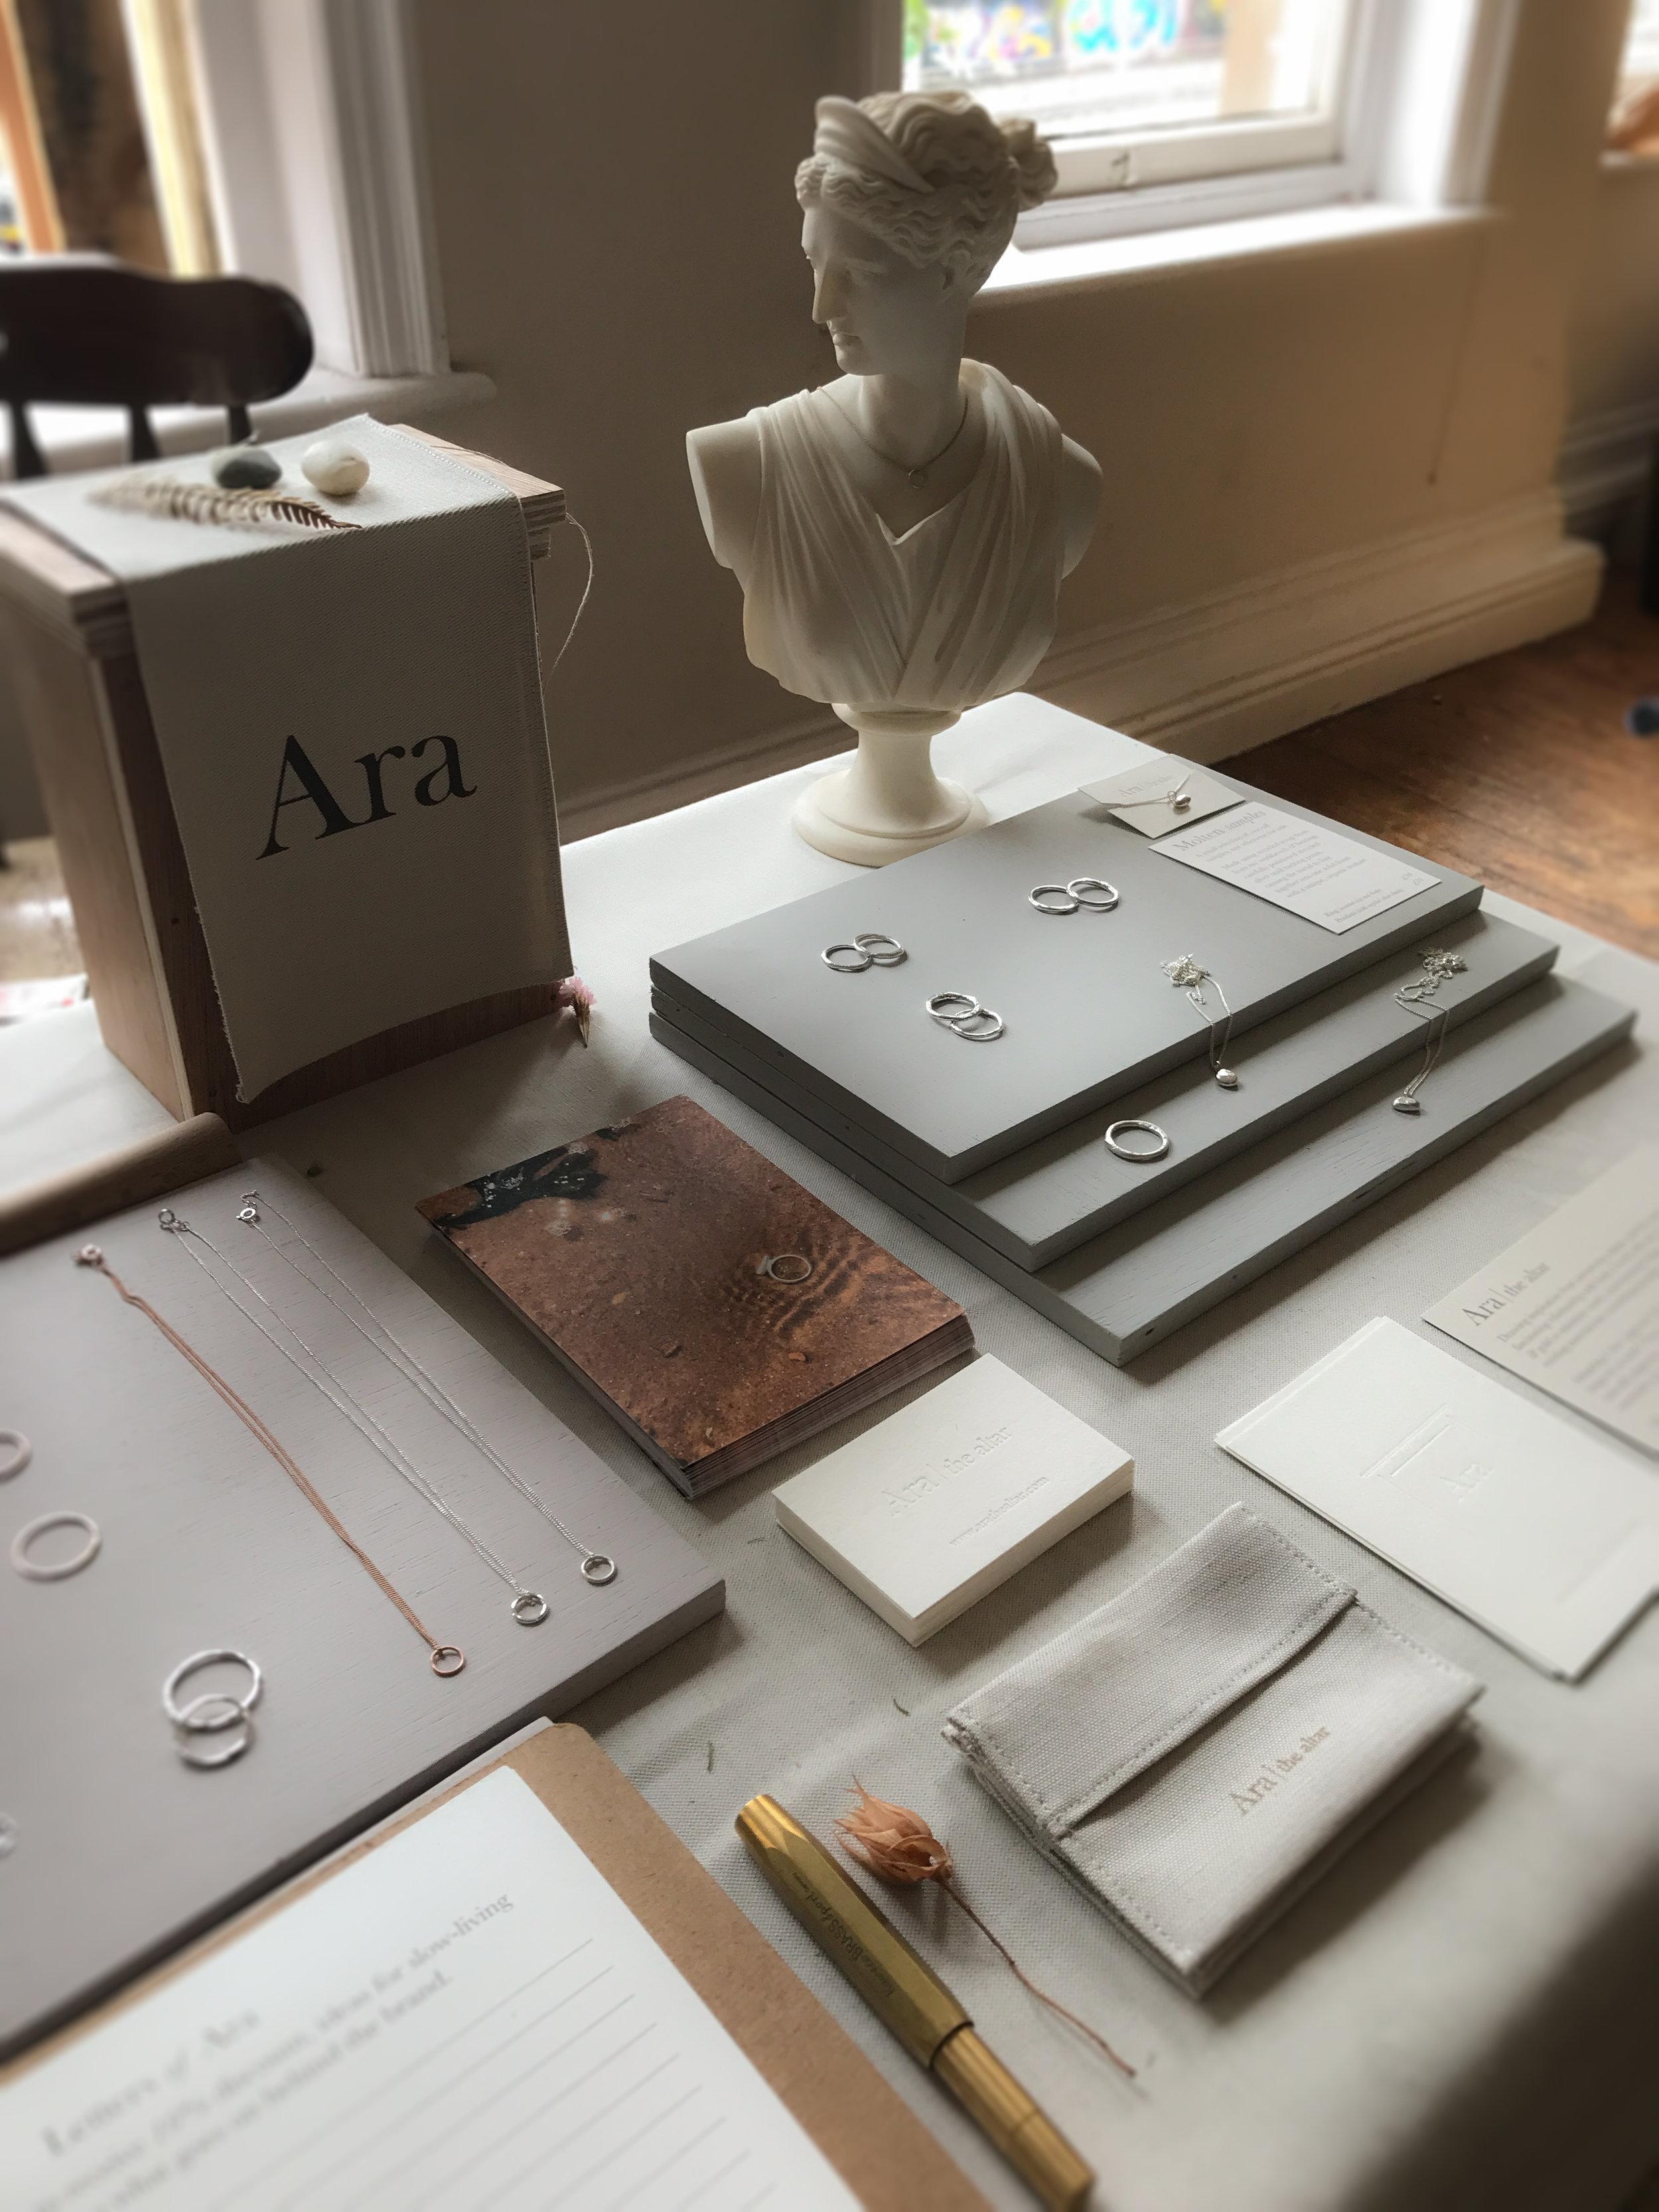 Ara the altar - a lammas gathering - set up 1